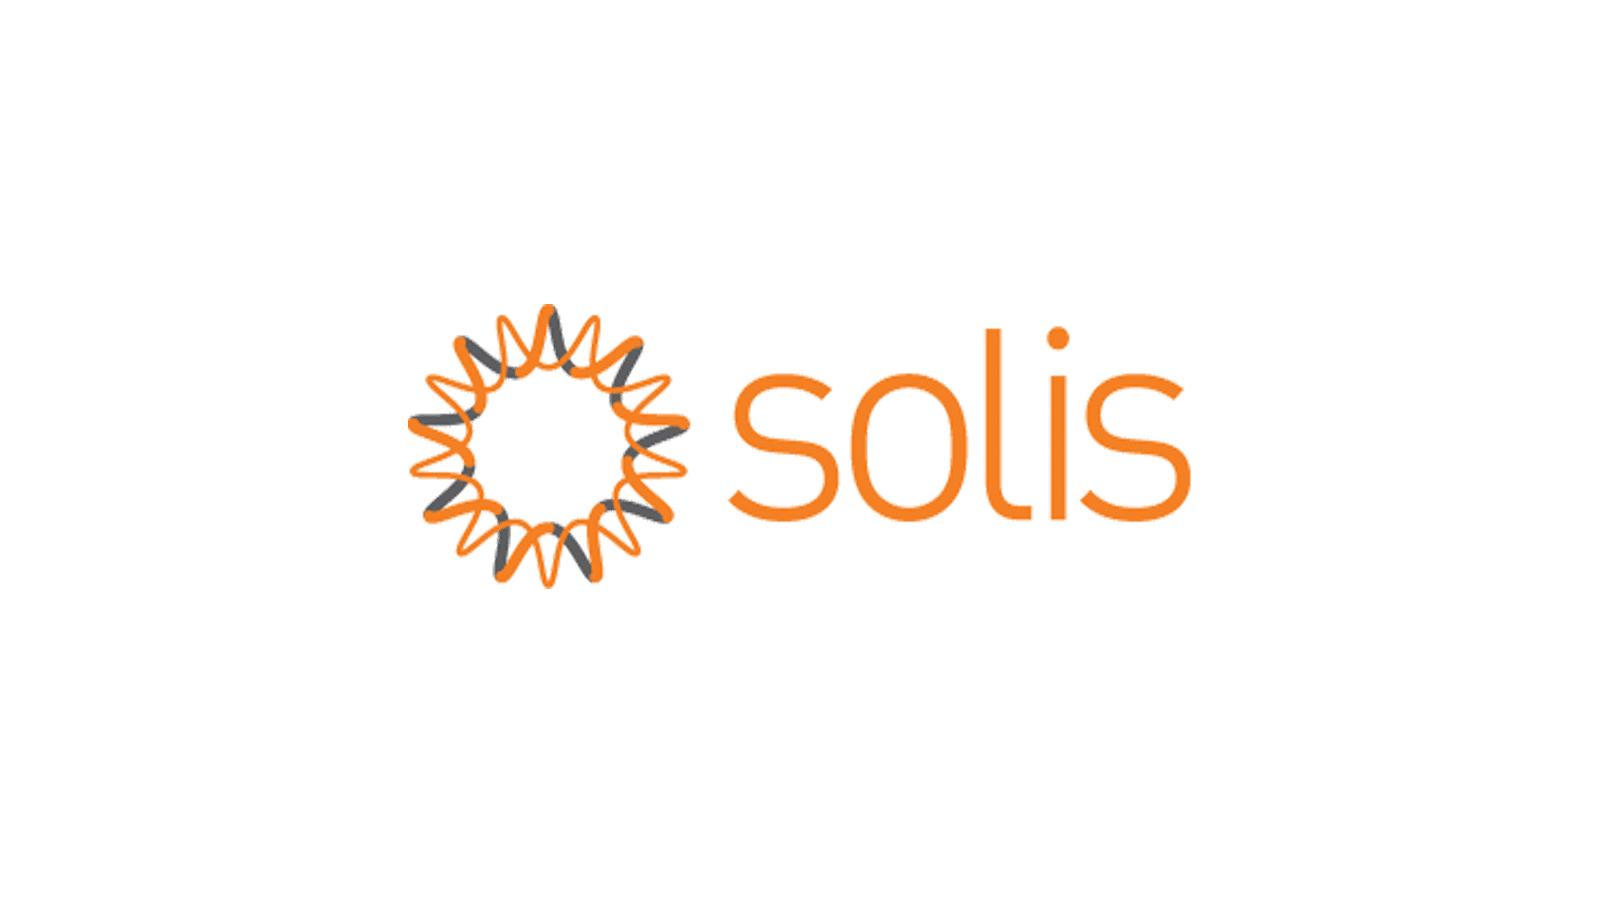 Green House Solutions zonnepanelen plaatsen partners 00018